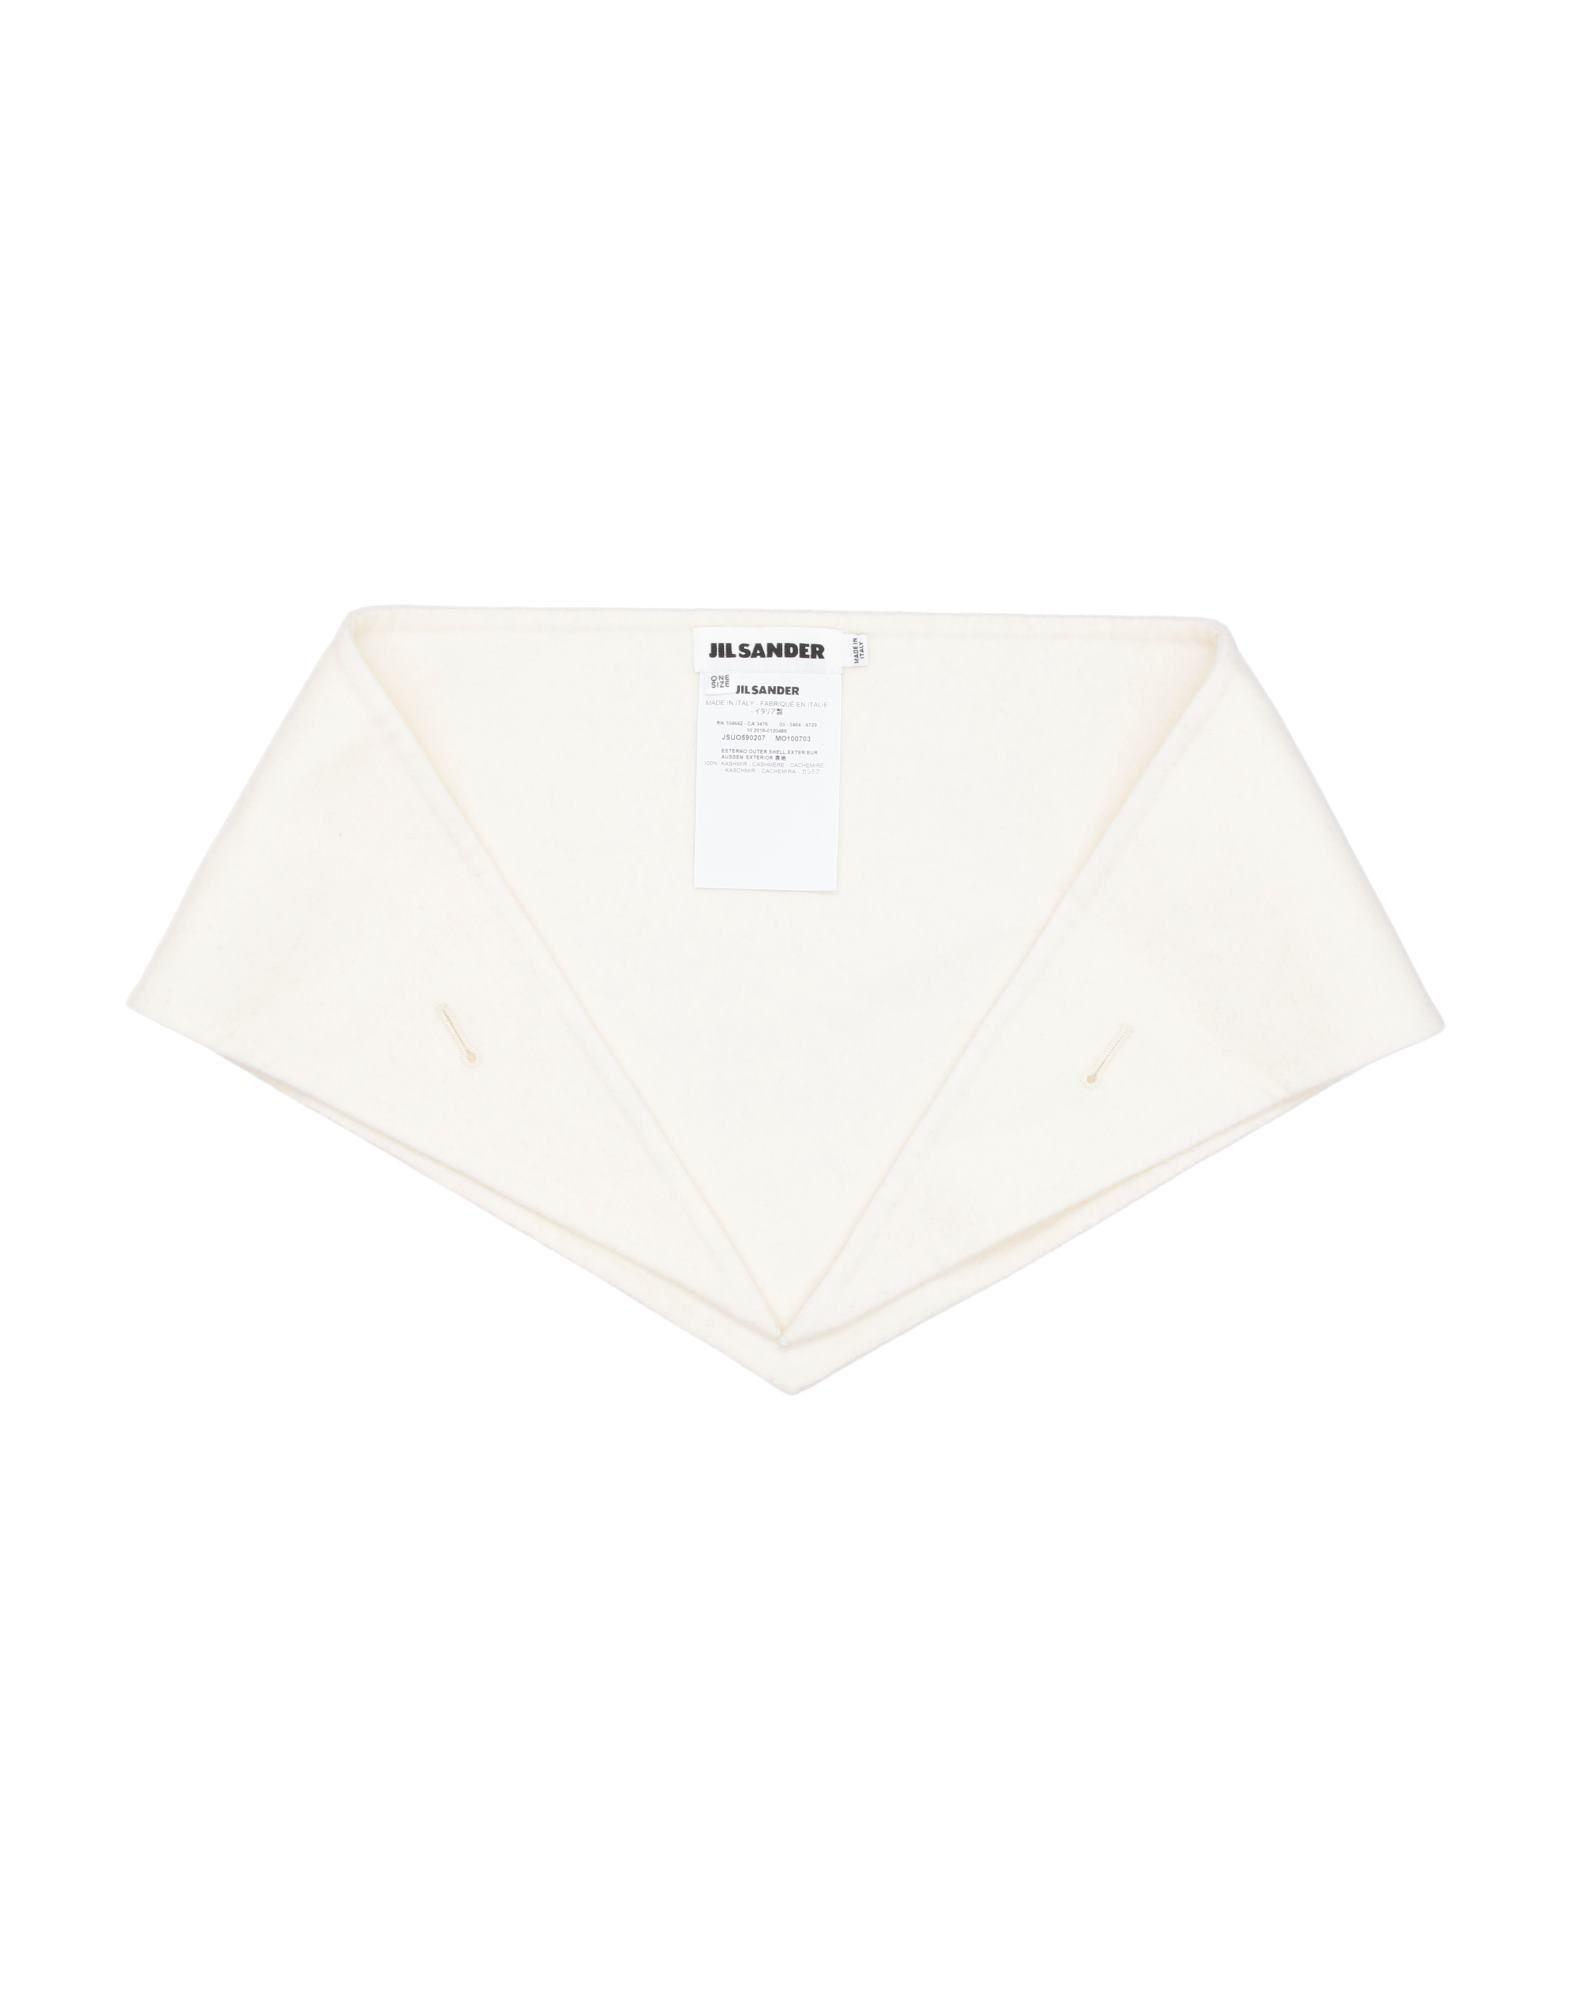 JIL SANDER Collars. no appliqués, flannel, basic solid color. 100% Cashmere